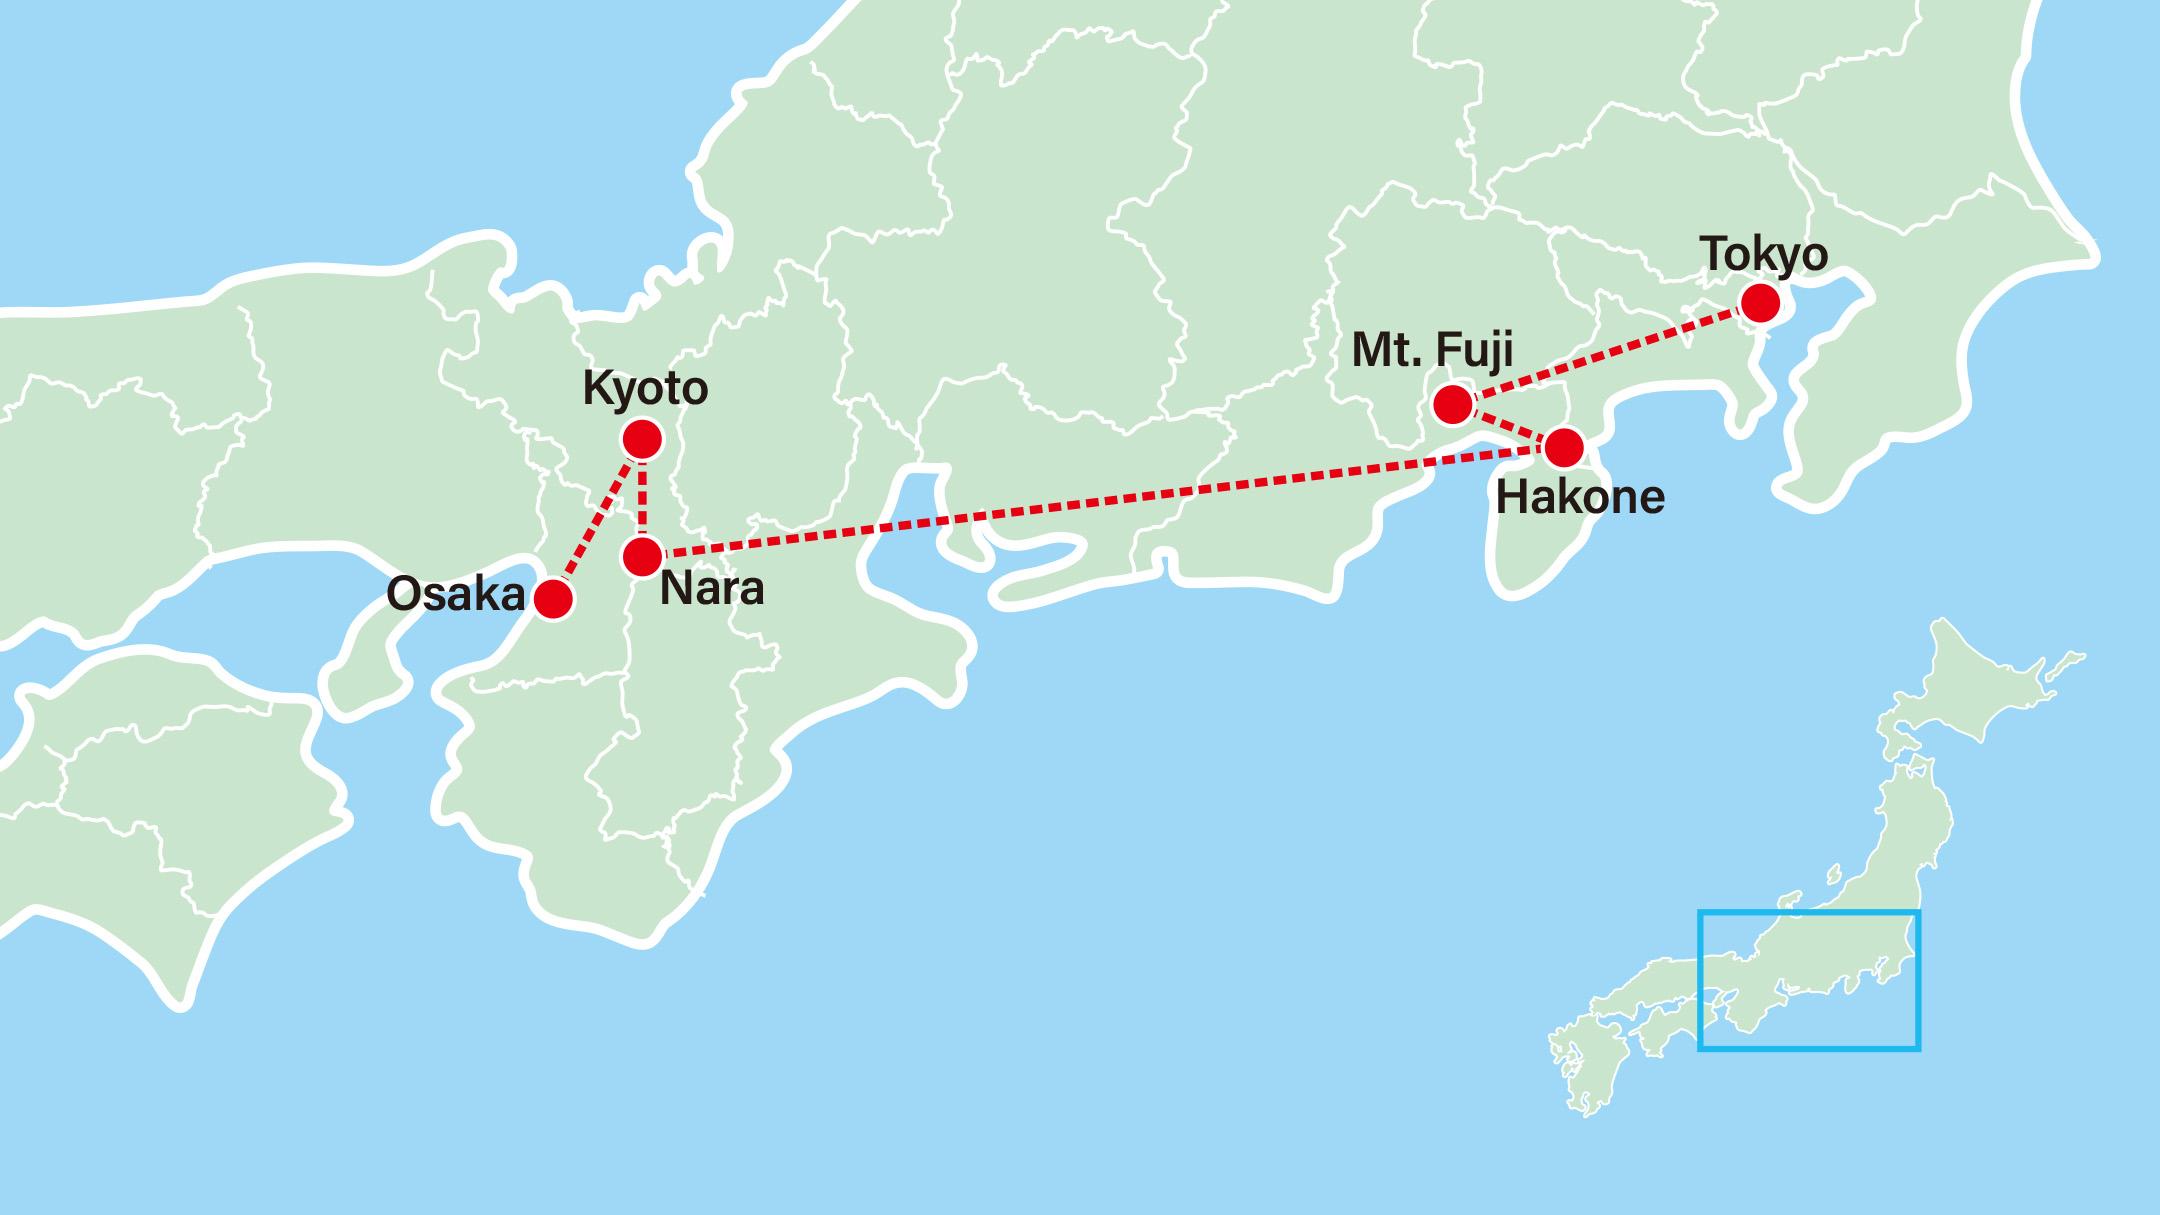 Anime Japan EXPO & Anime Street Festa 10 Days-Kyoto-Nara-Mt. Fuji-Hakone-Tokyo-Yokohama